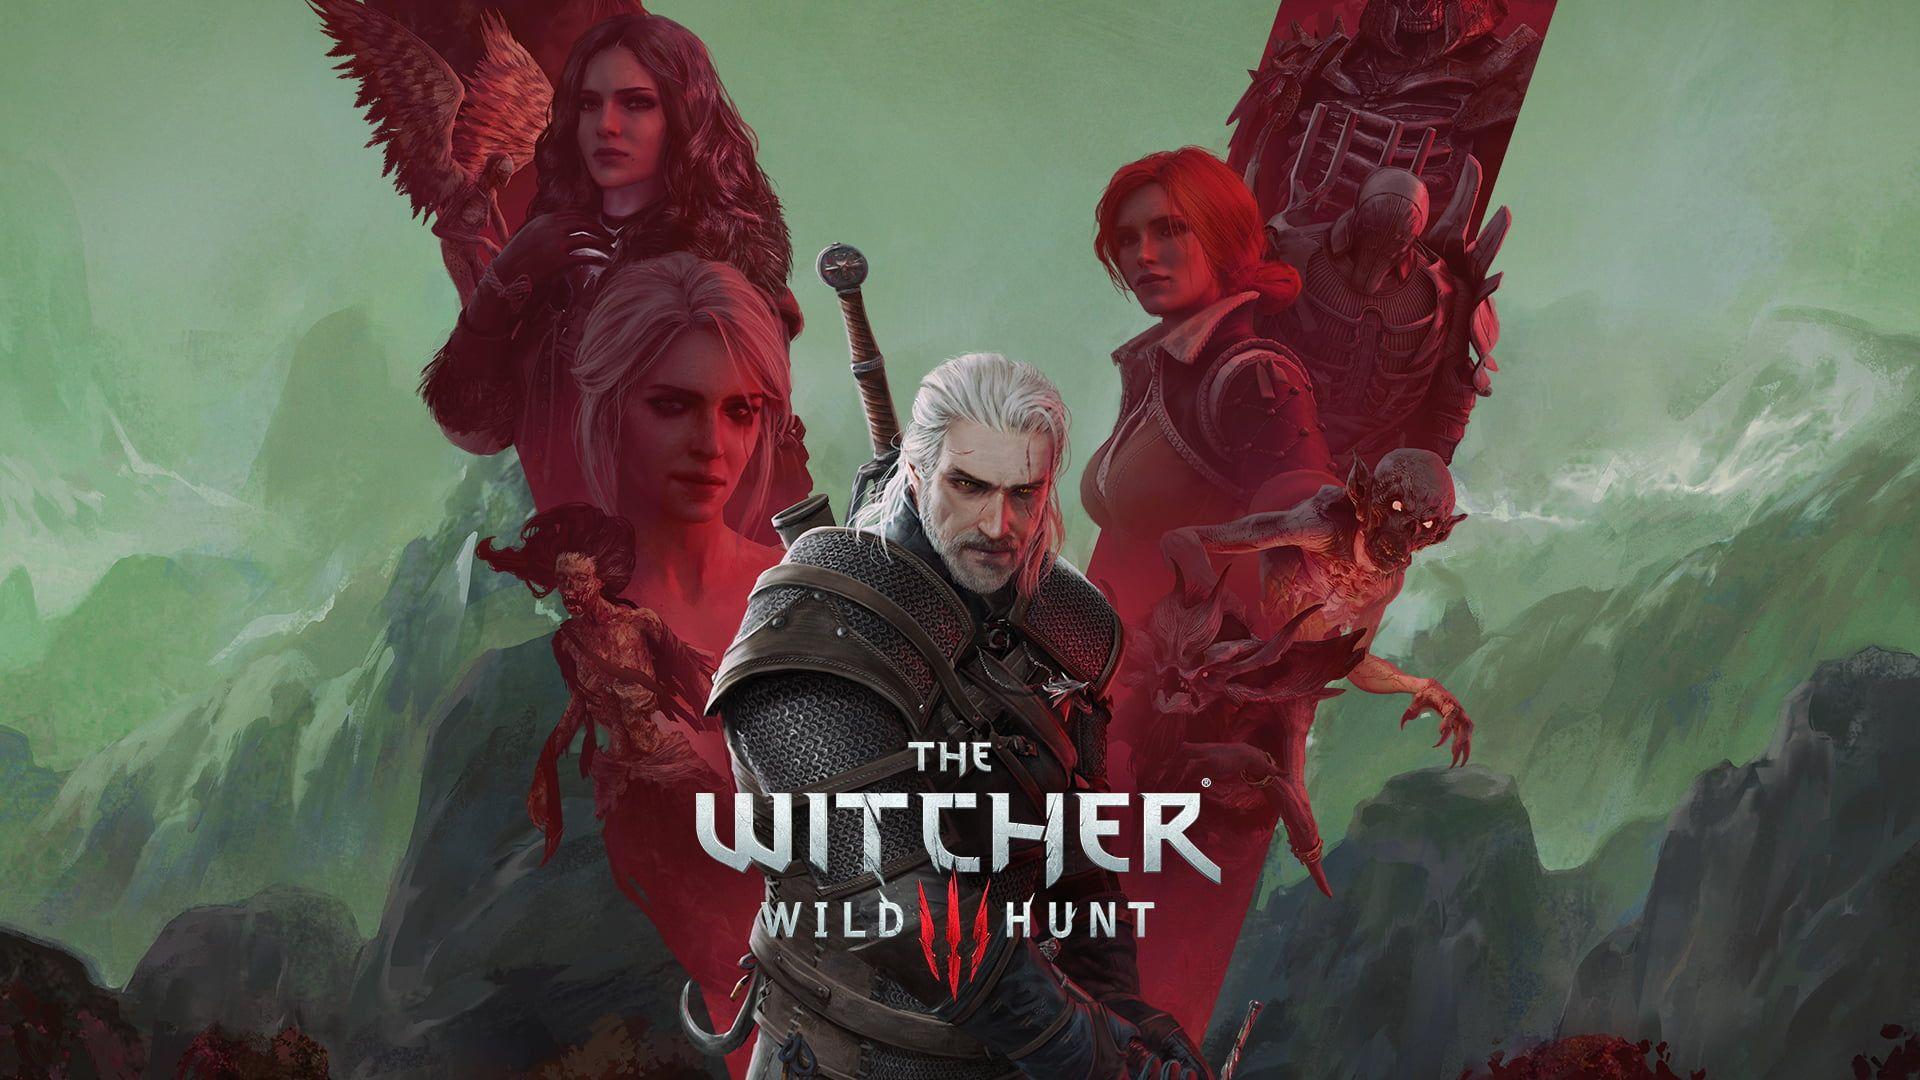 The Witcher The Witcher 3 Wild Hunt Geralt Of Rivia Cirilla Fiona Elen Riannon Ciri Triss Merigold Yennef In 2020 The Witcher The Witcher Wild Hunt The Witcher Books